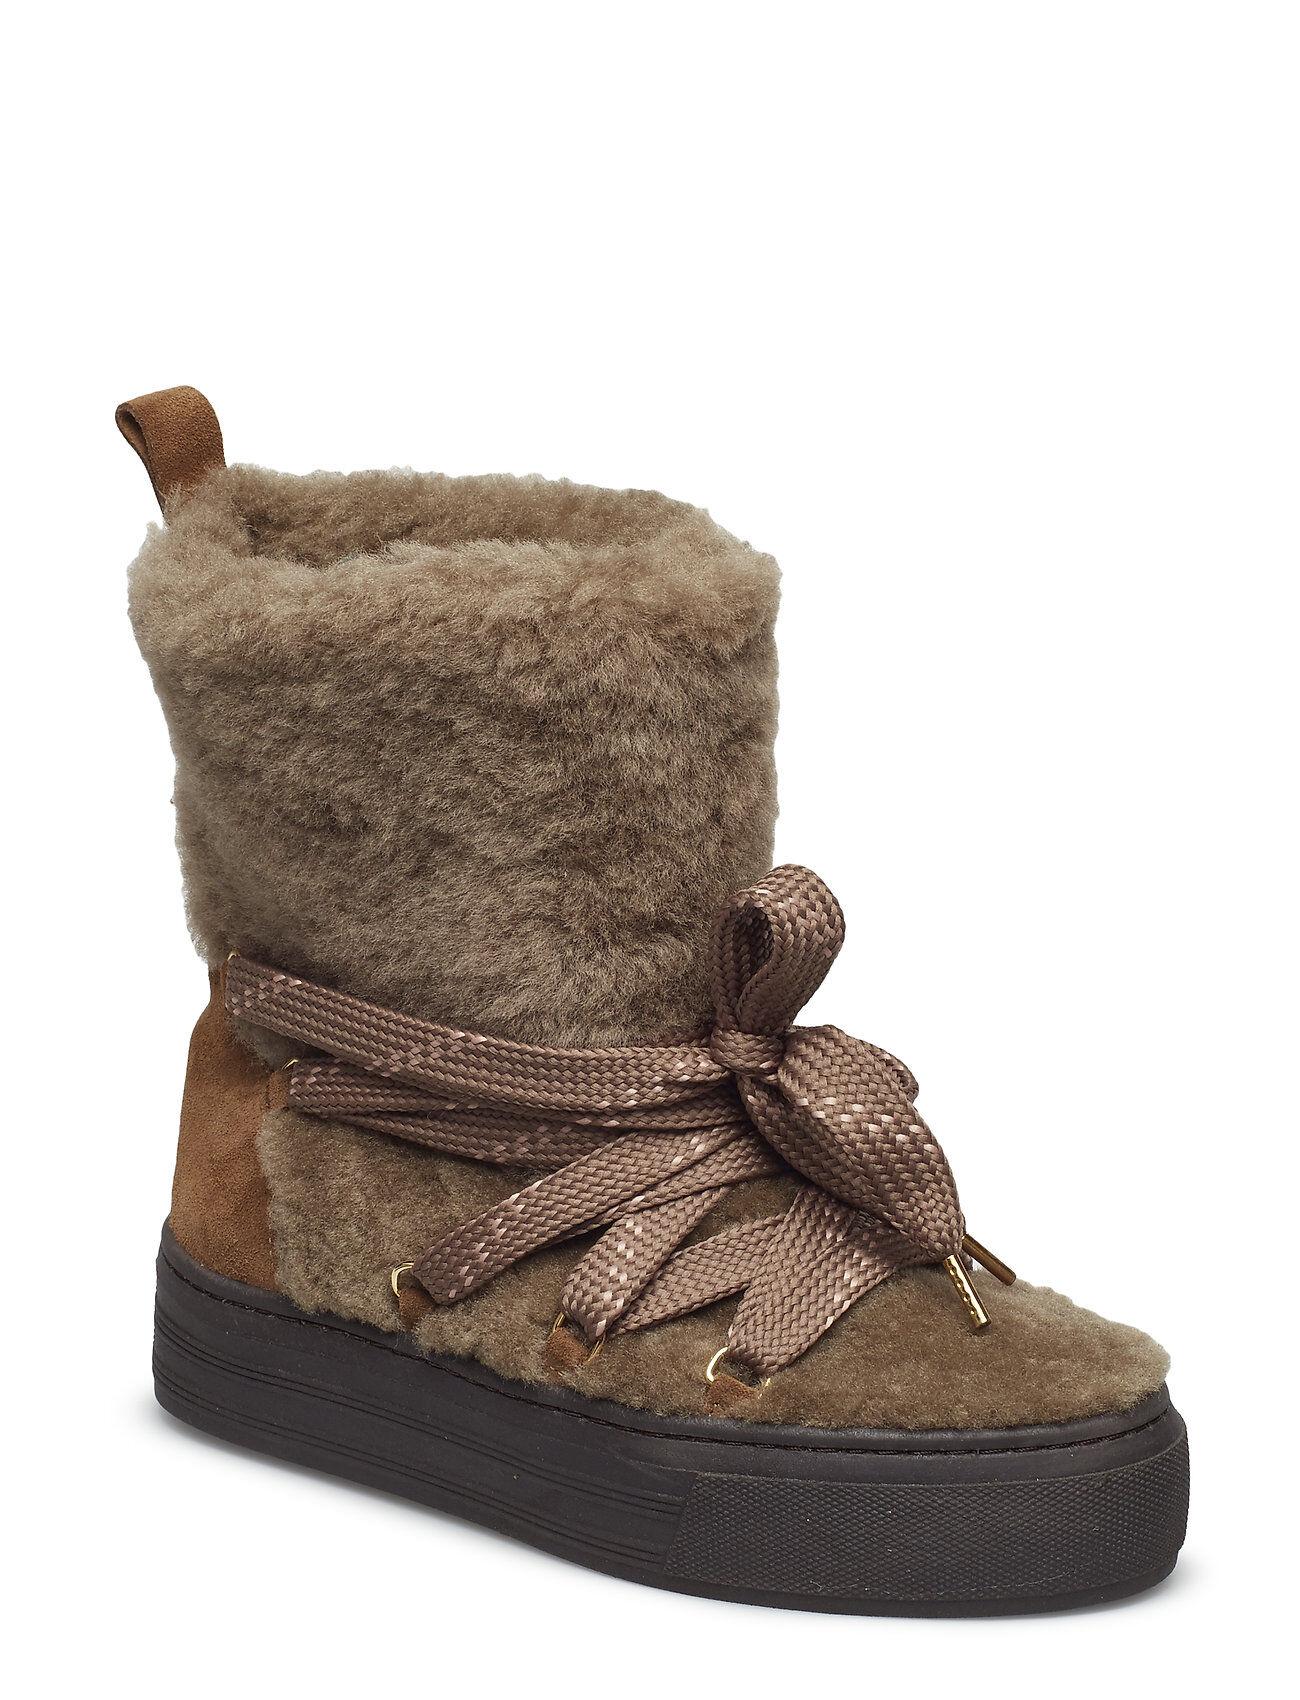 STINE GOYA Gale, 456 Gale Boots